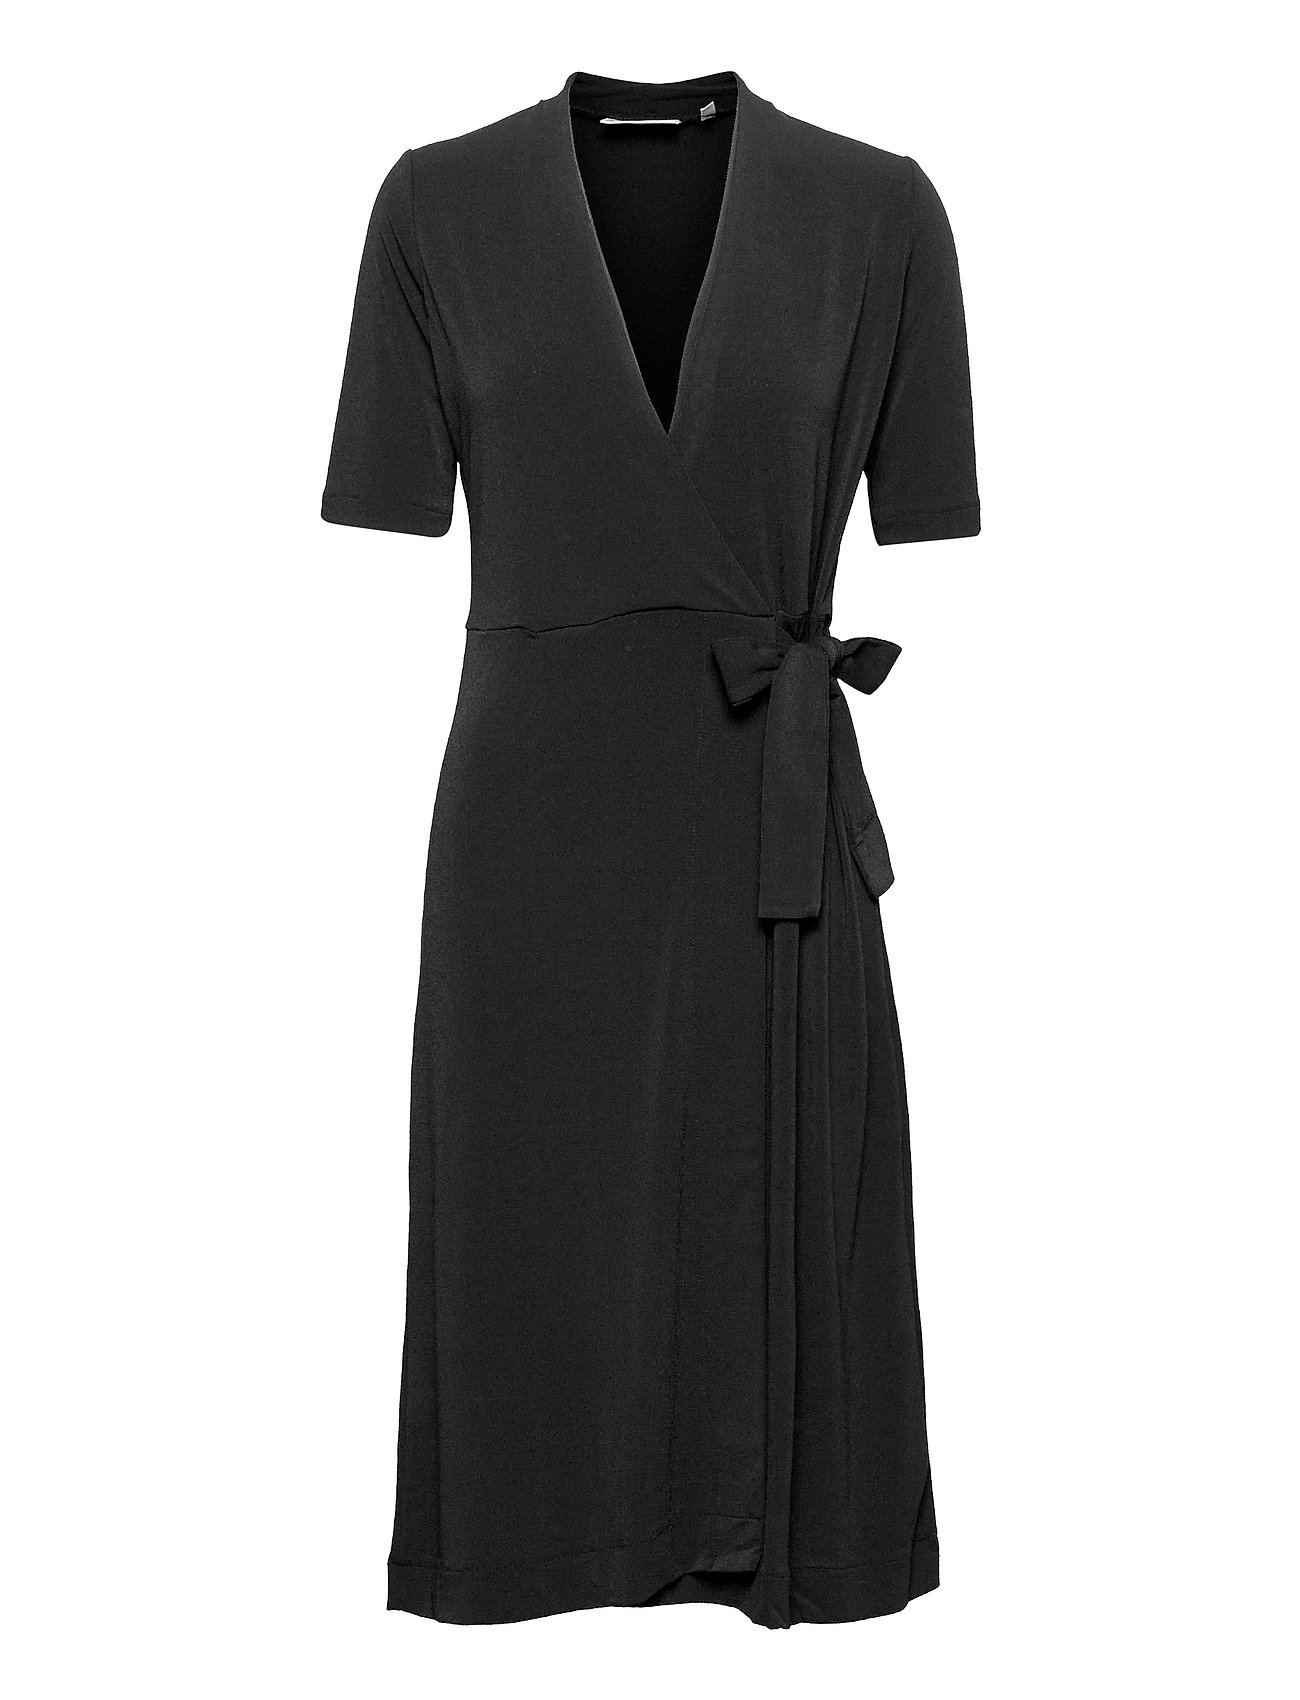 Beniw Wrap Dress Dresses Everyday Dresses Sort InWear